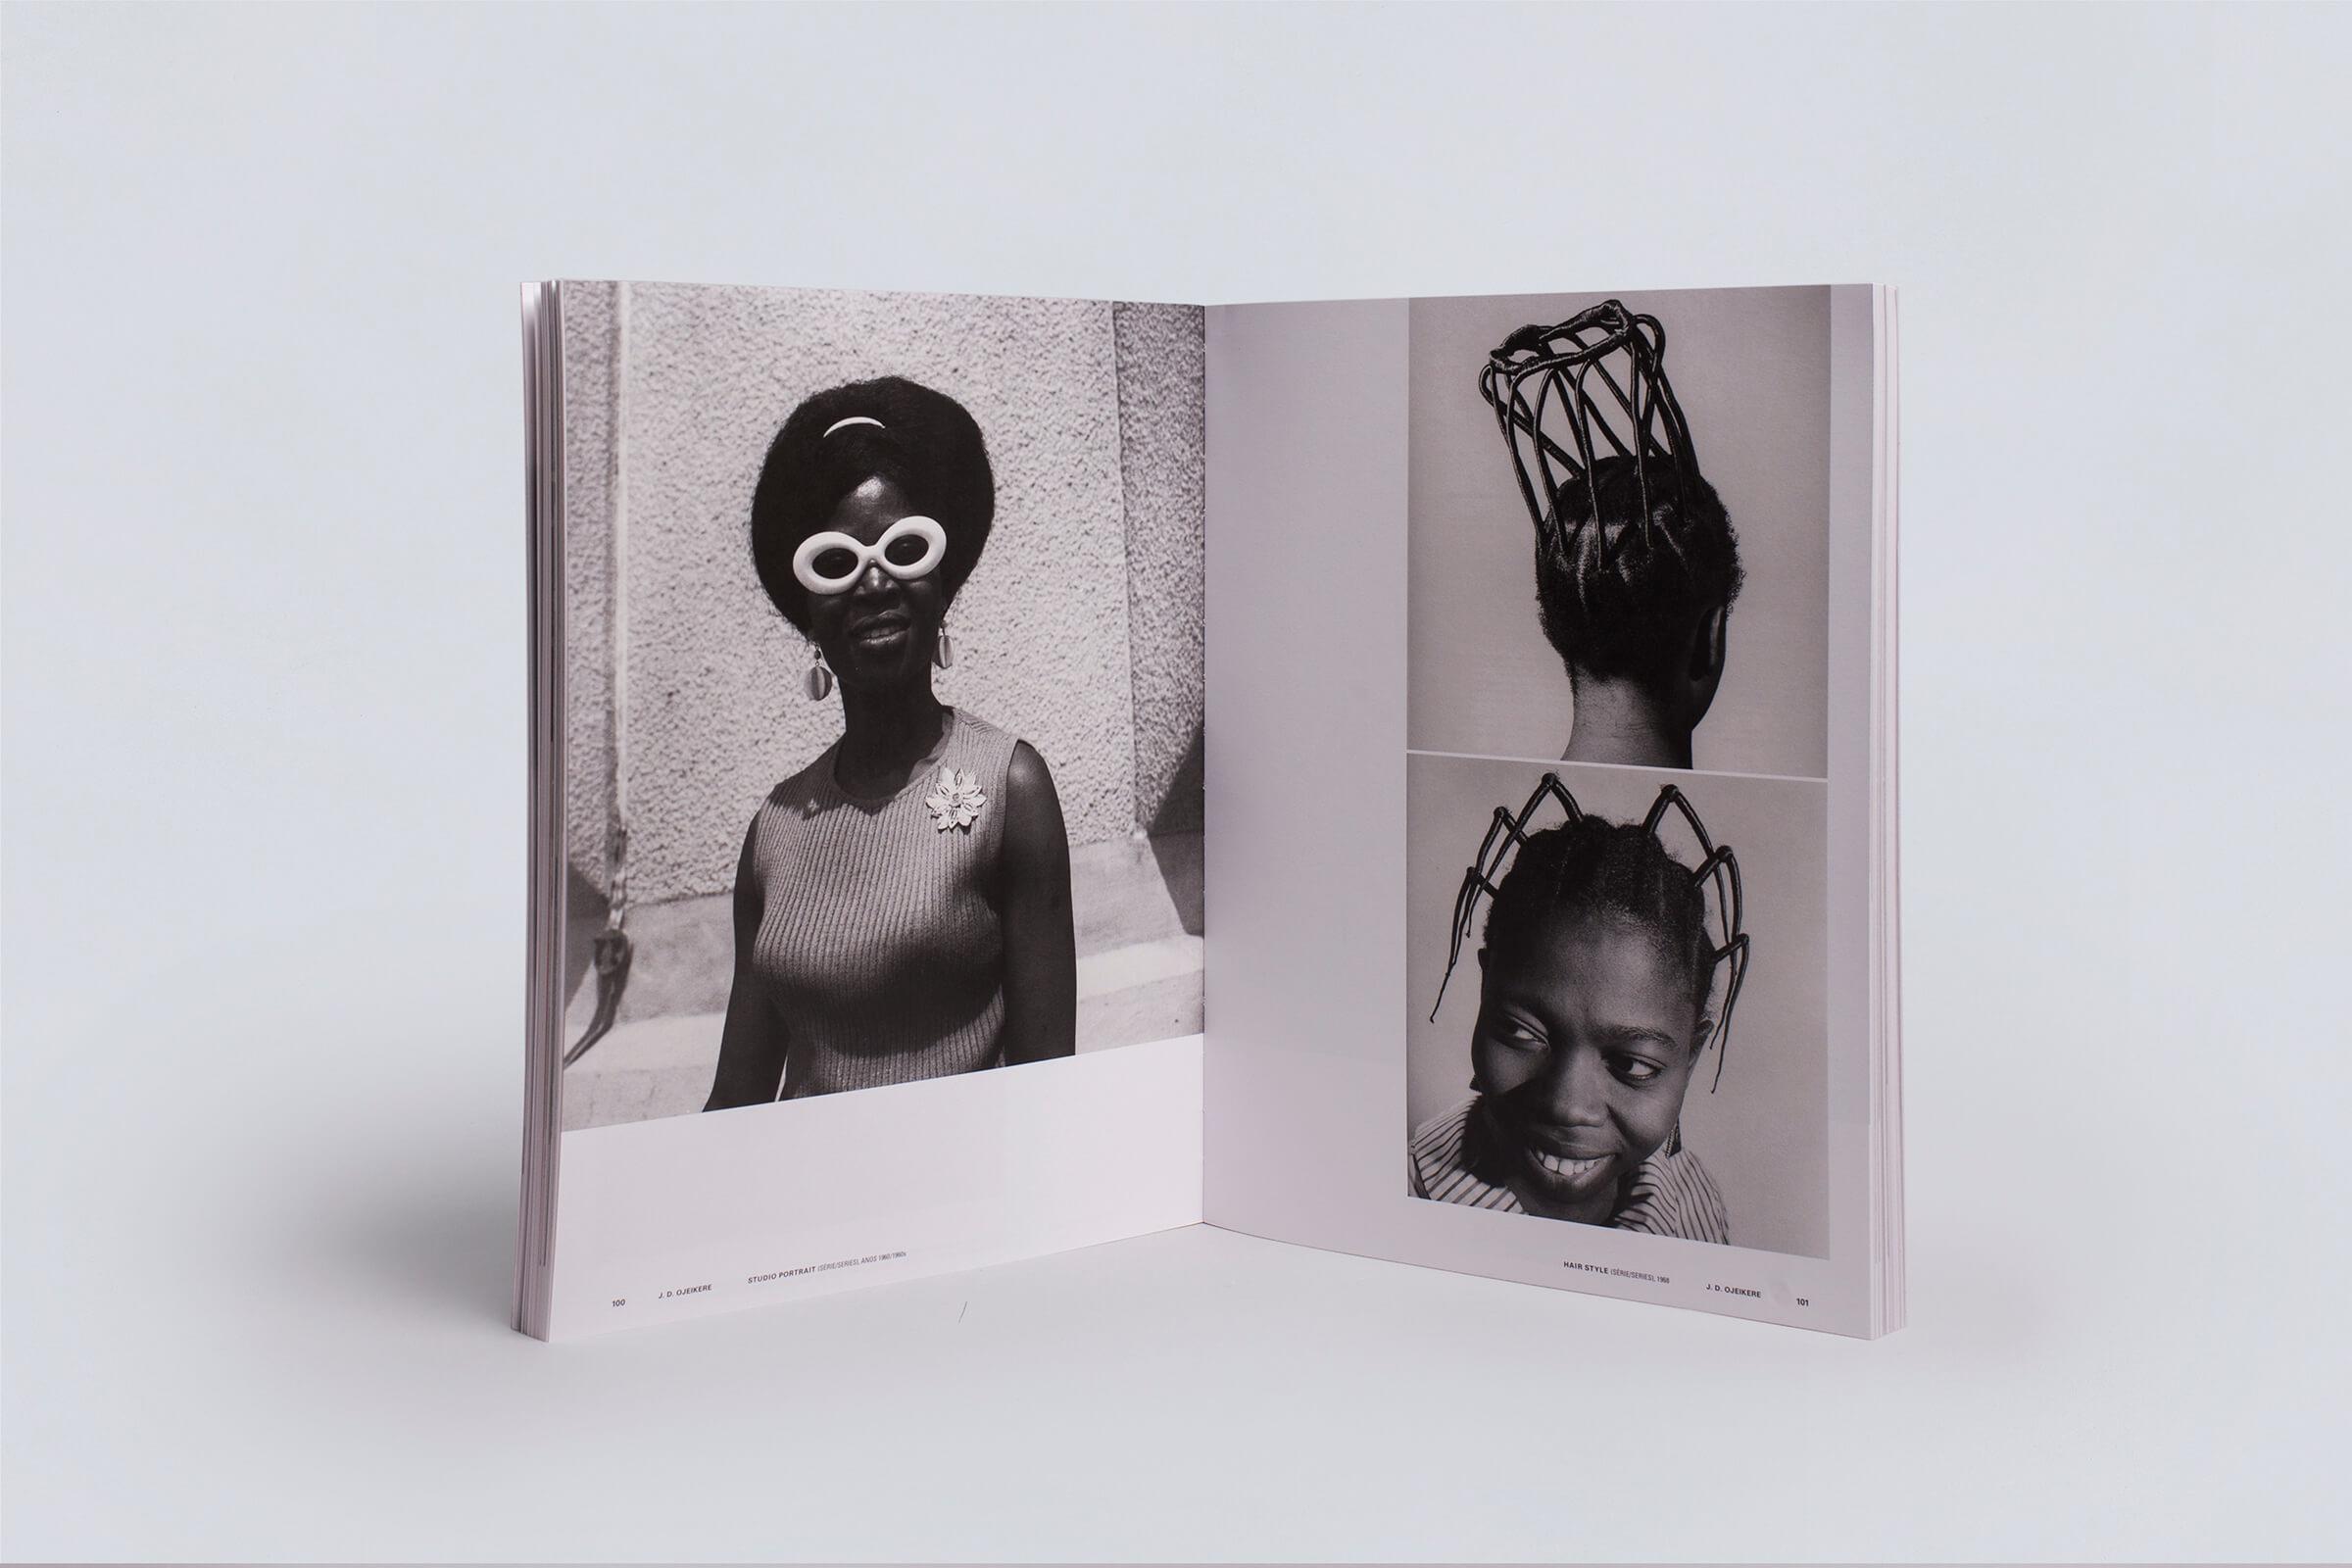 africa see you see me fotografo fabio cunha galerias municipais